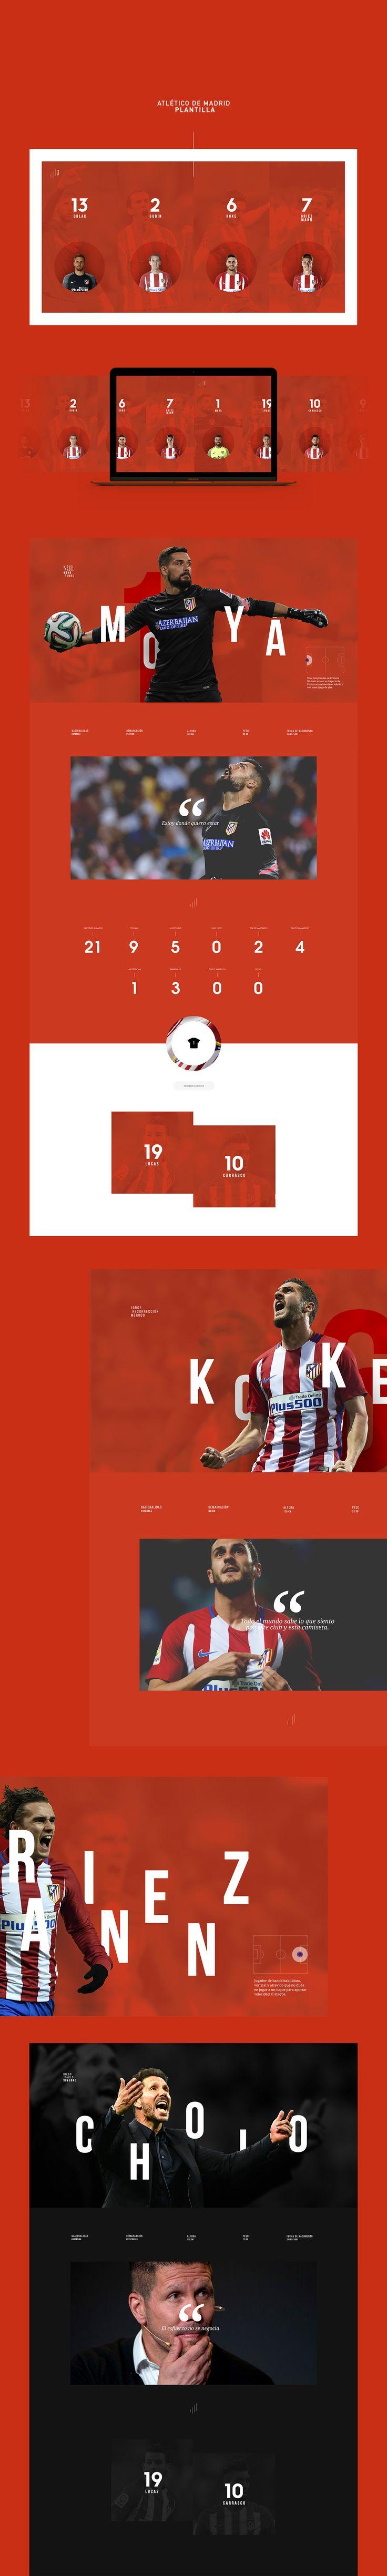 Confira este projeto do @Behance: \u201cRedesign concept Atlético de Madrid Web Site\u201d https://www.behance.net/gallery/53072653/Redesign-concept-Atltico-de-Madrid-Web-Site